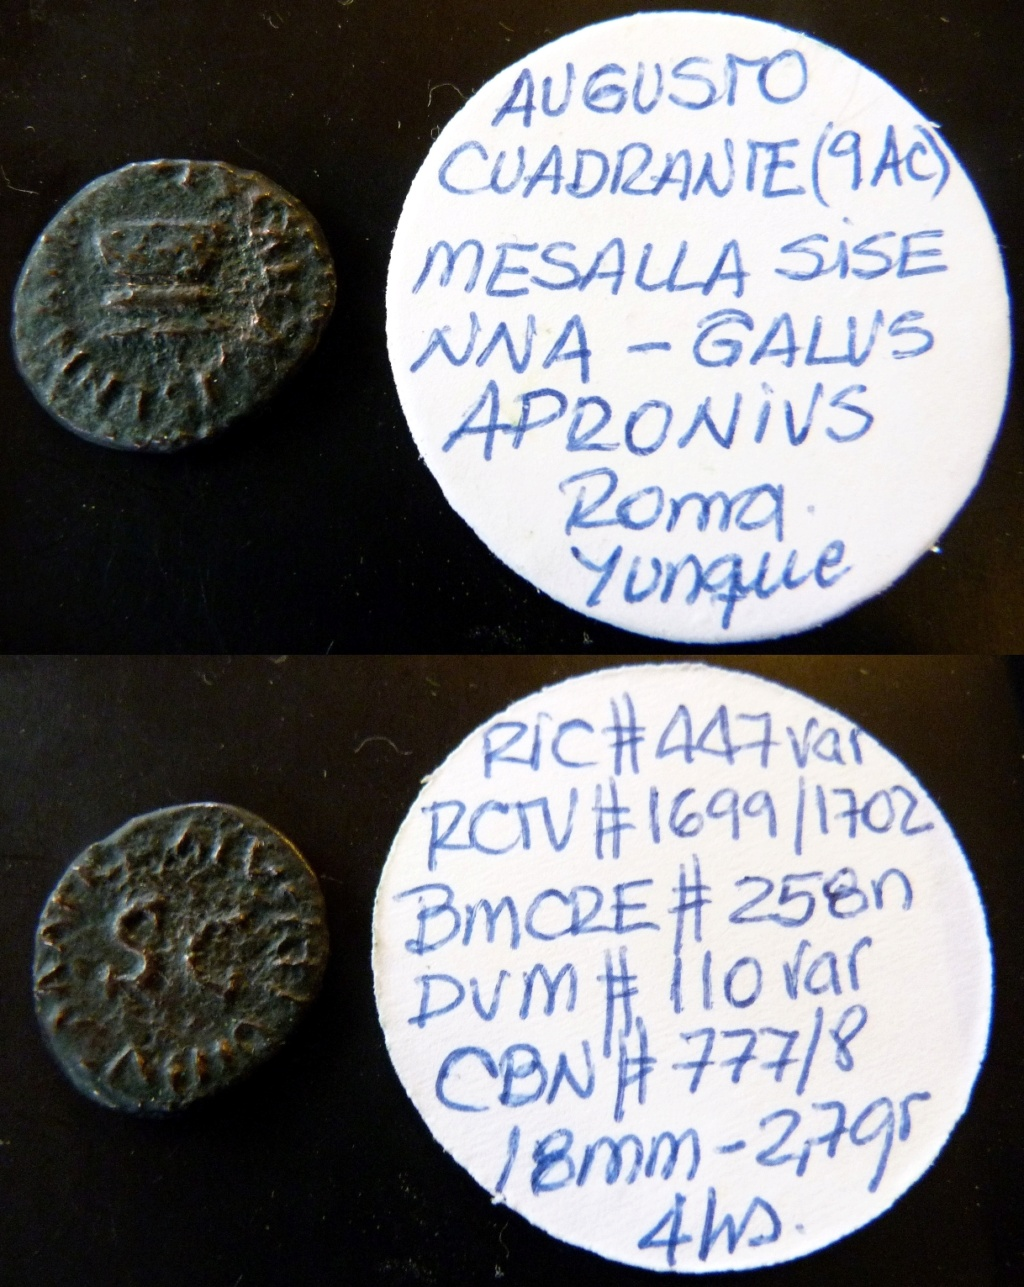 Cuadrante de Augusto, MESSALLA SISENNA III VIR / GALVS APRONIVS AAAFF, Roma, 9 aC. Ric_i_17